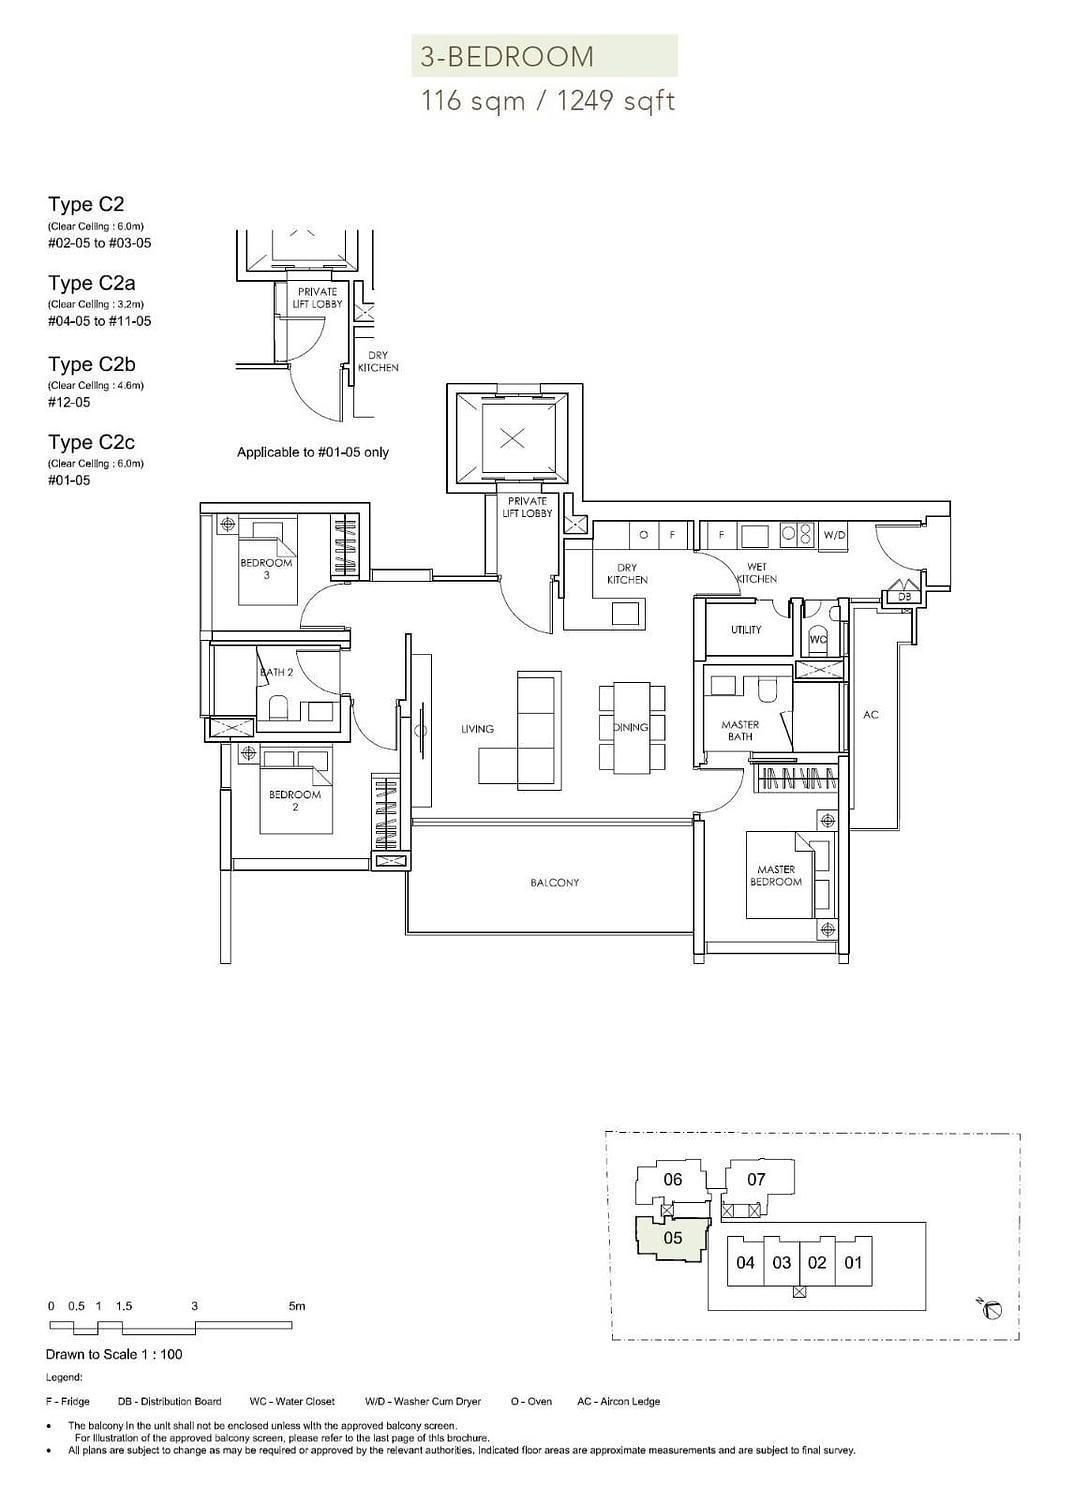 Sloane Residences Sloane Residences Floorplan C2a